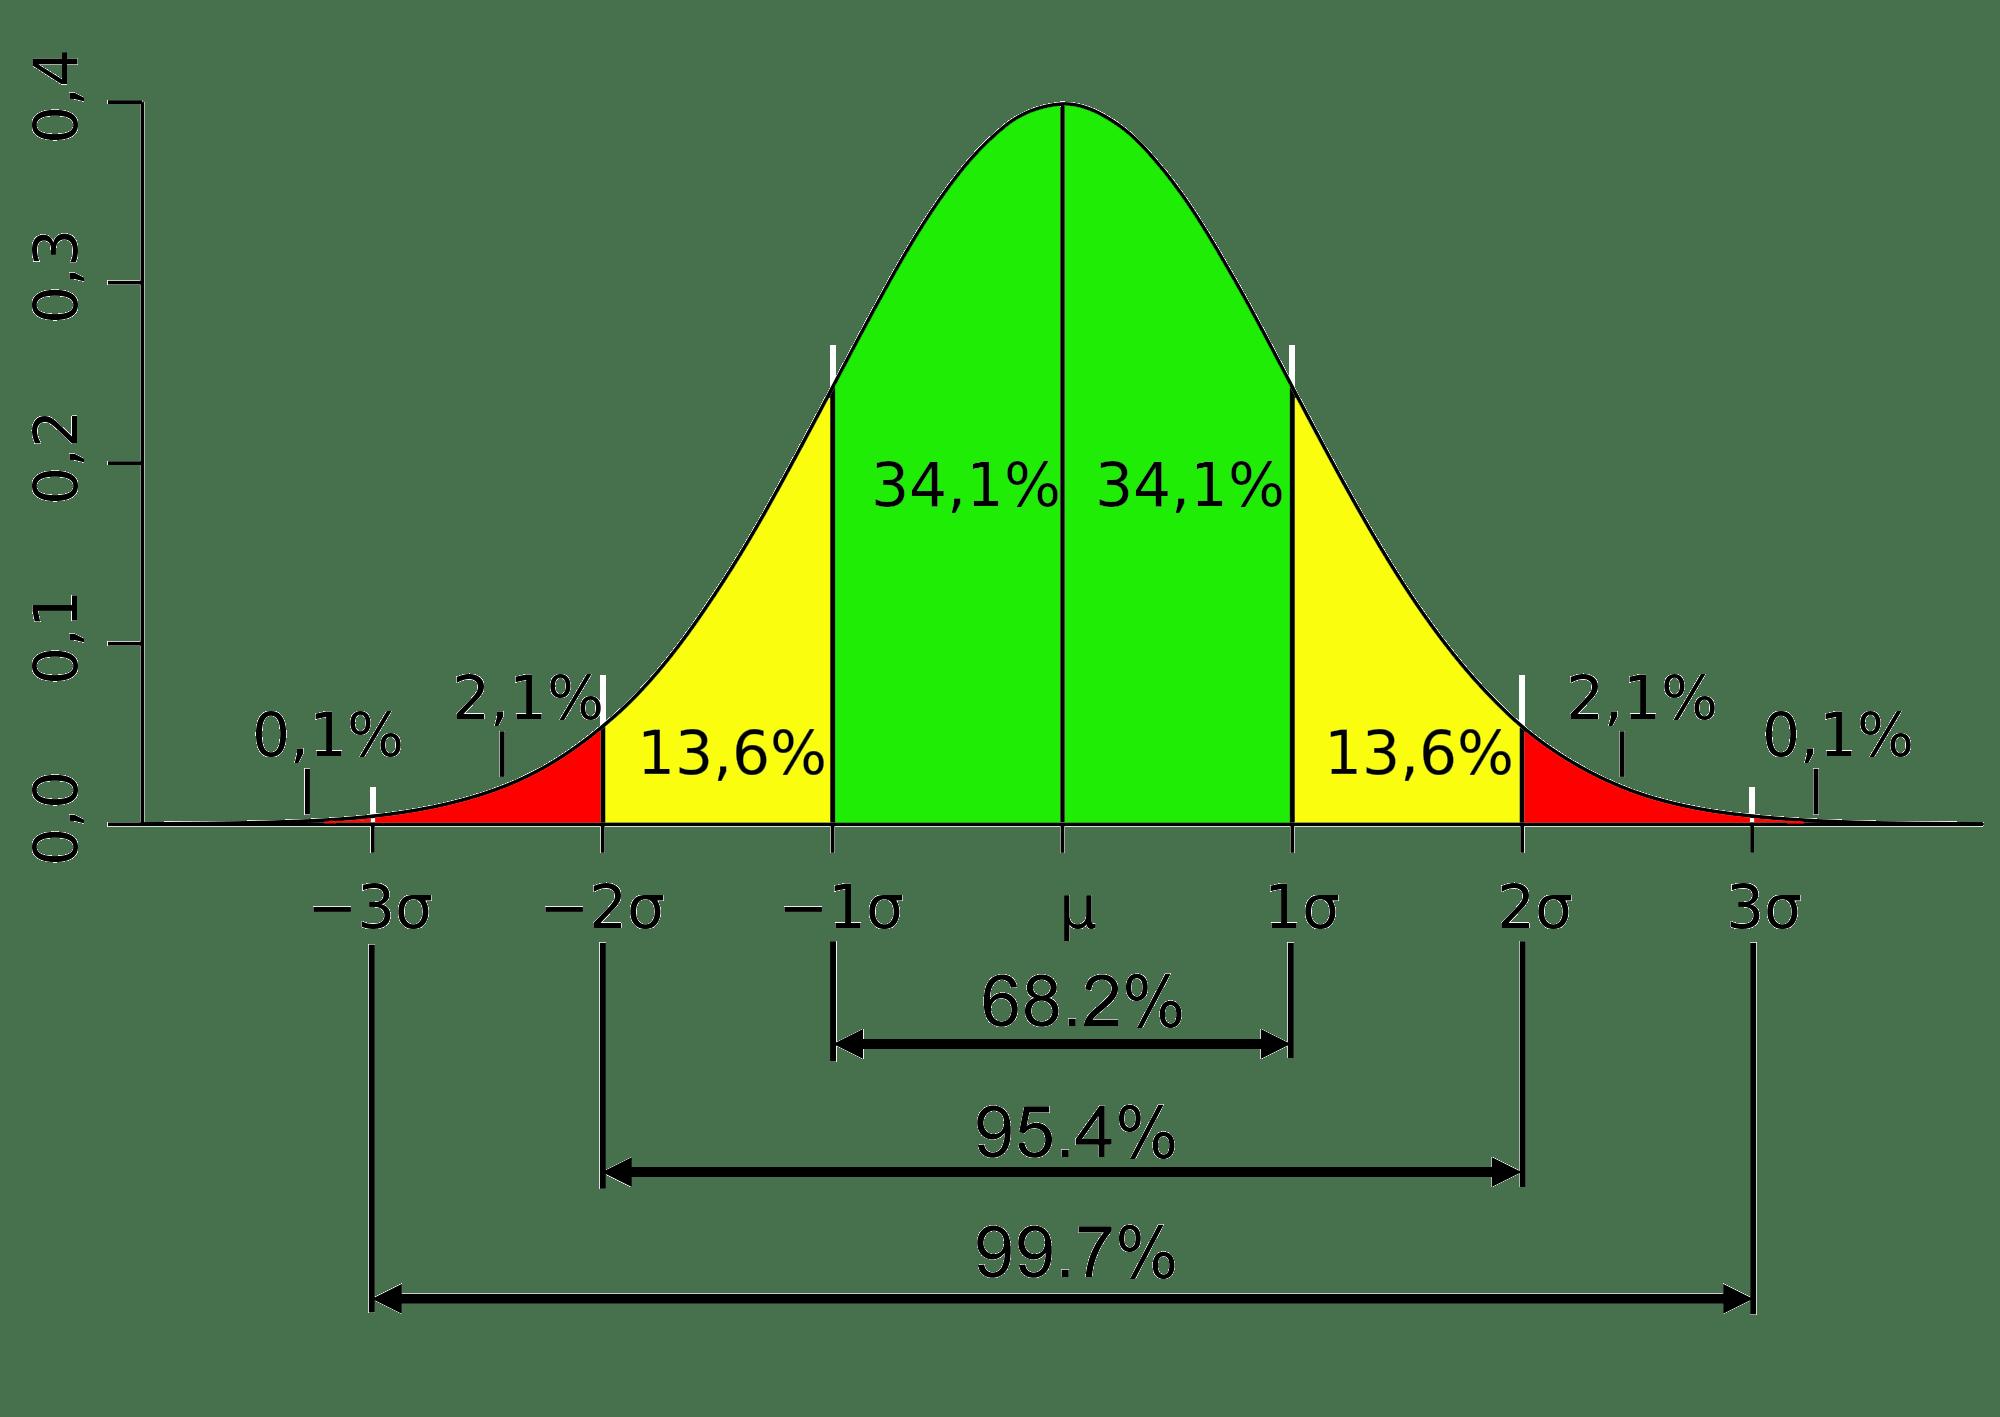 Basic Newsroom Math And Statistics